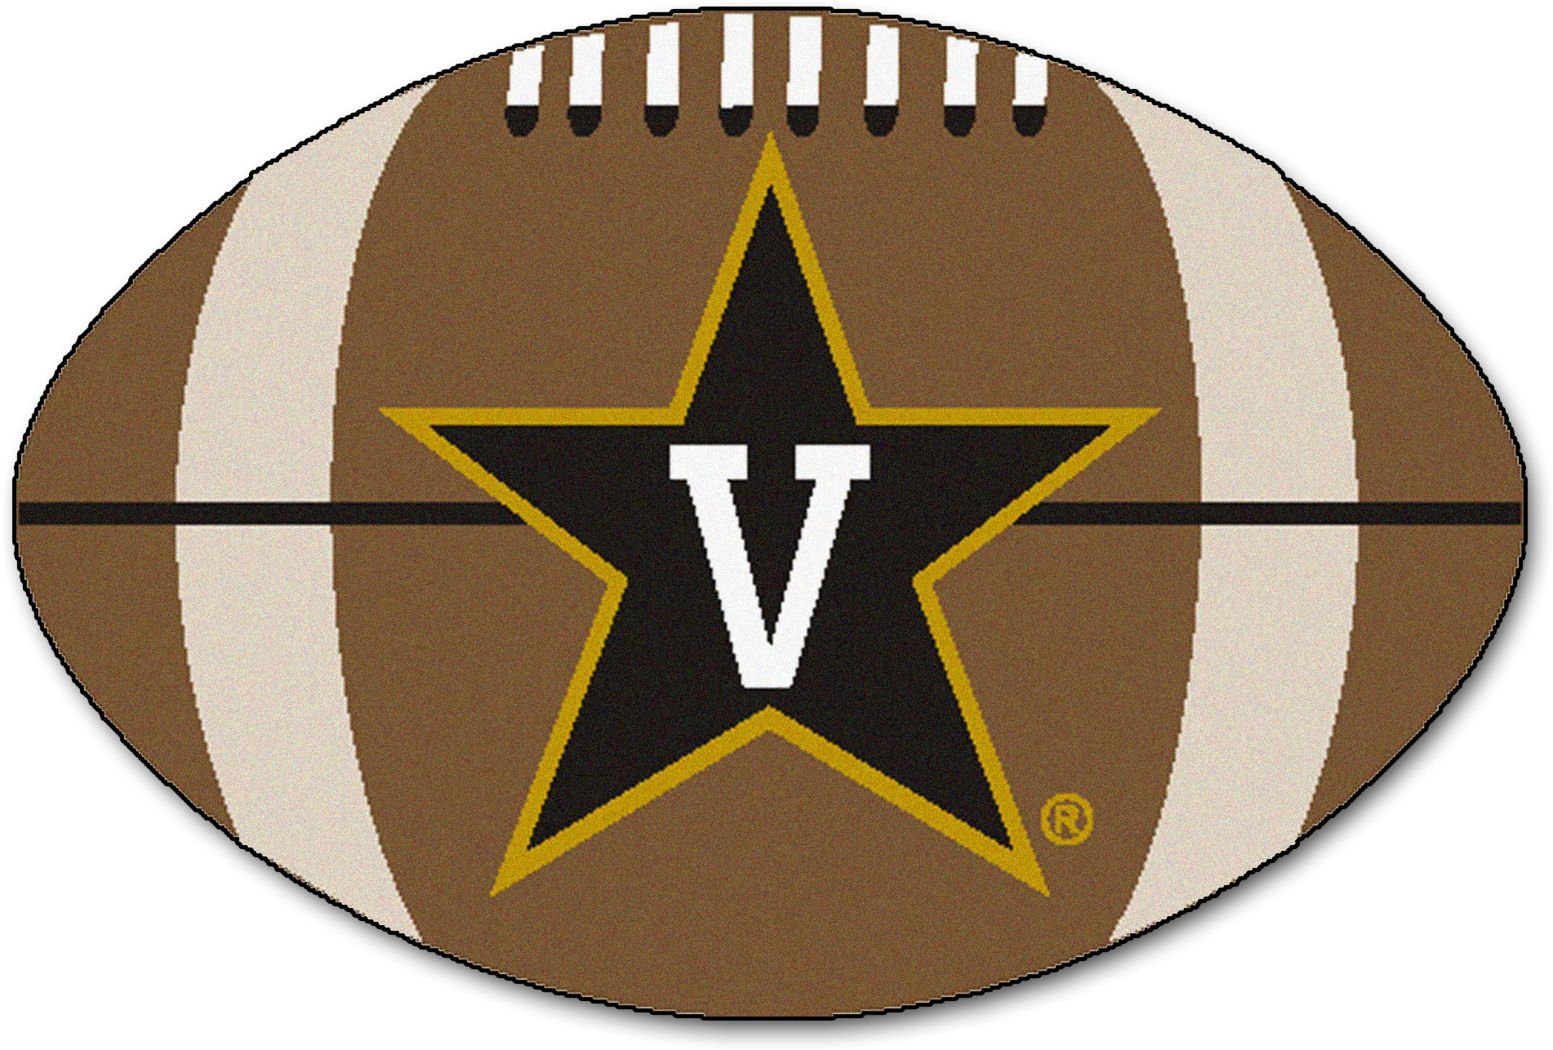 "NCAA Football Mascot Vanderbilt University 1'6"" x 1'10"" Rug"